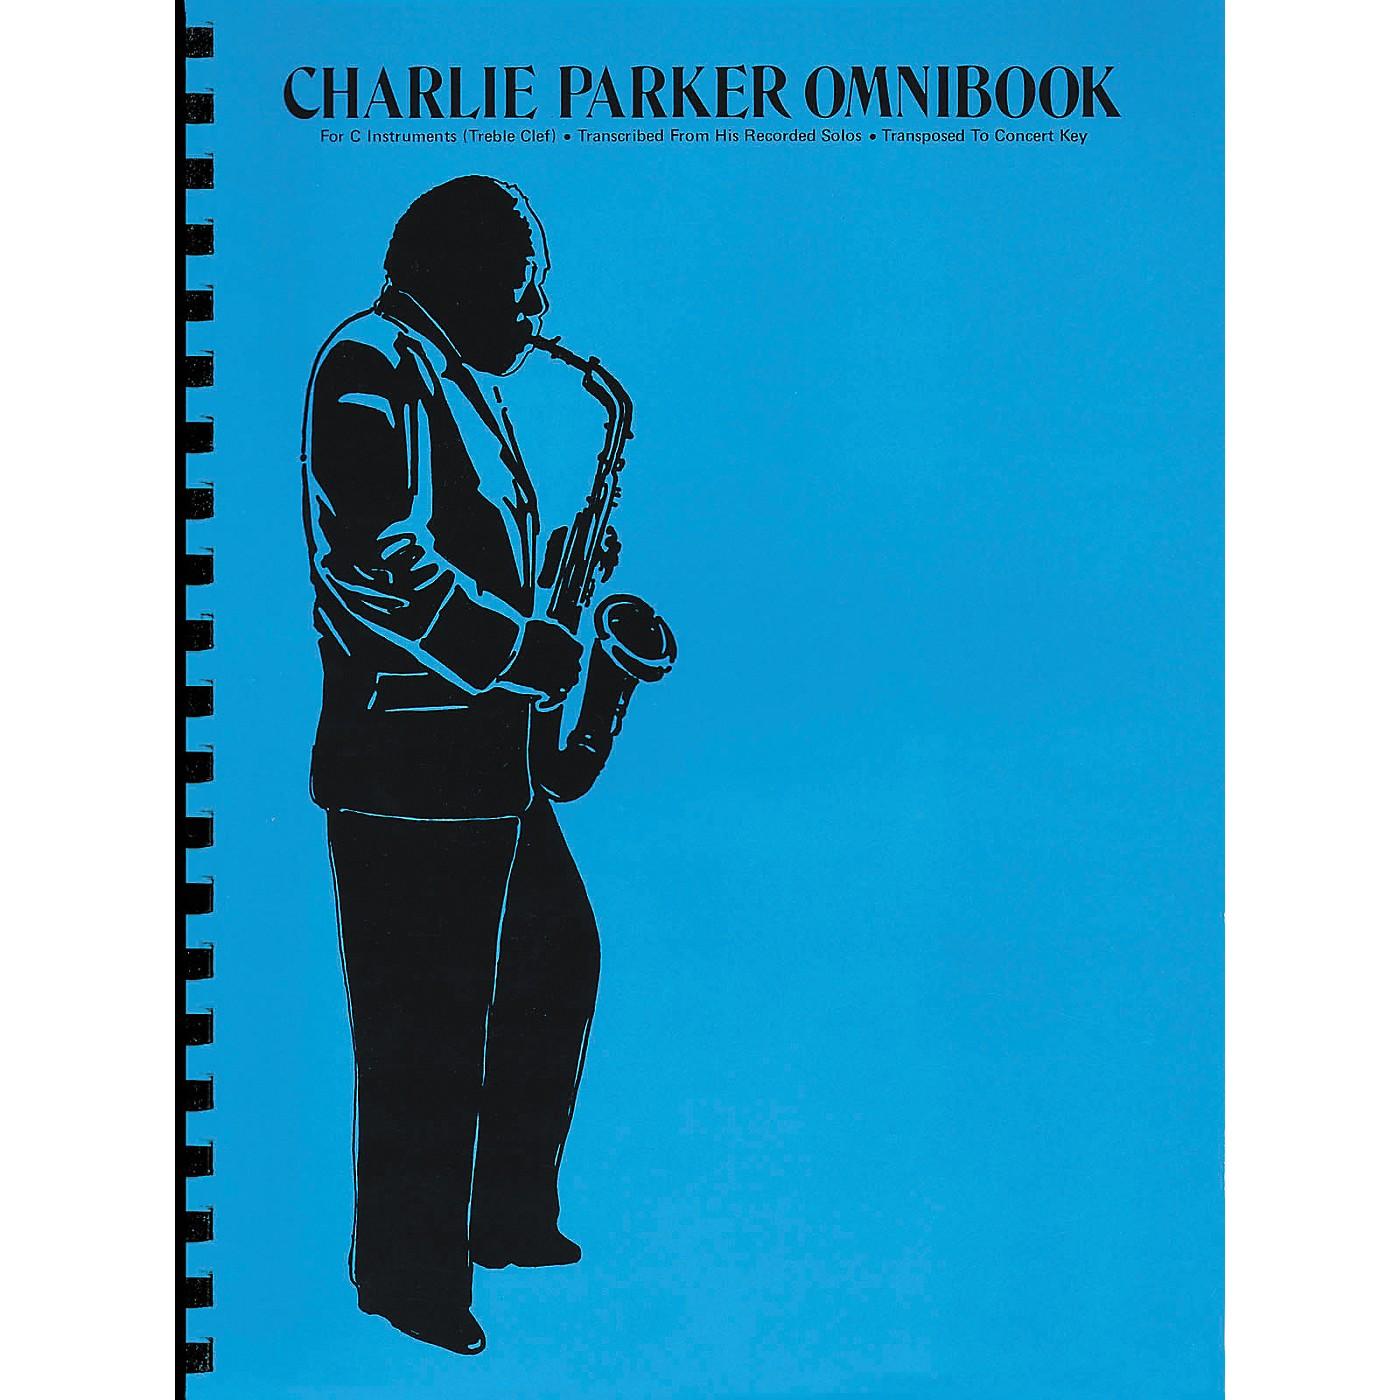 Hal Leonard Charlie Parker Omnibook for C Instruments Treble Clef thumbnail